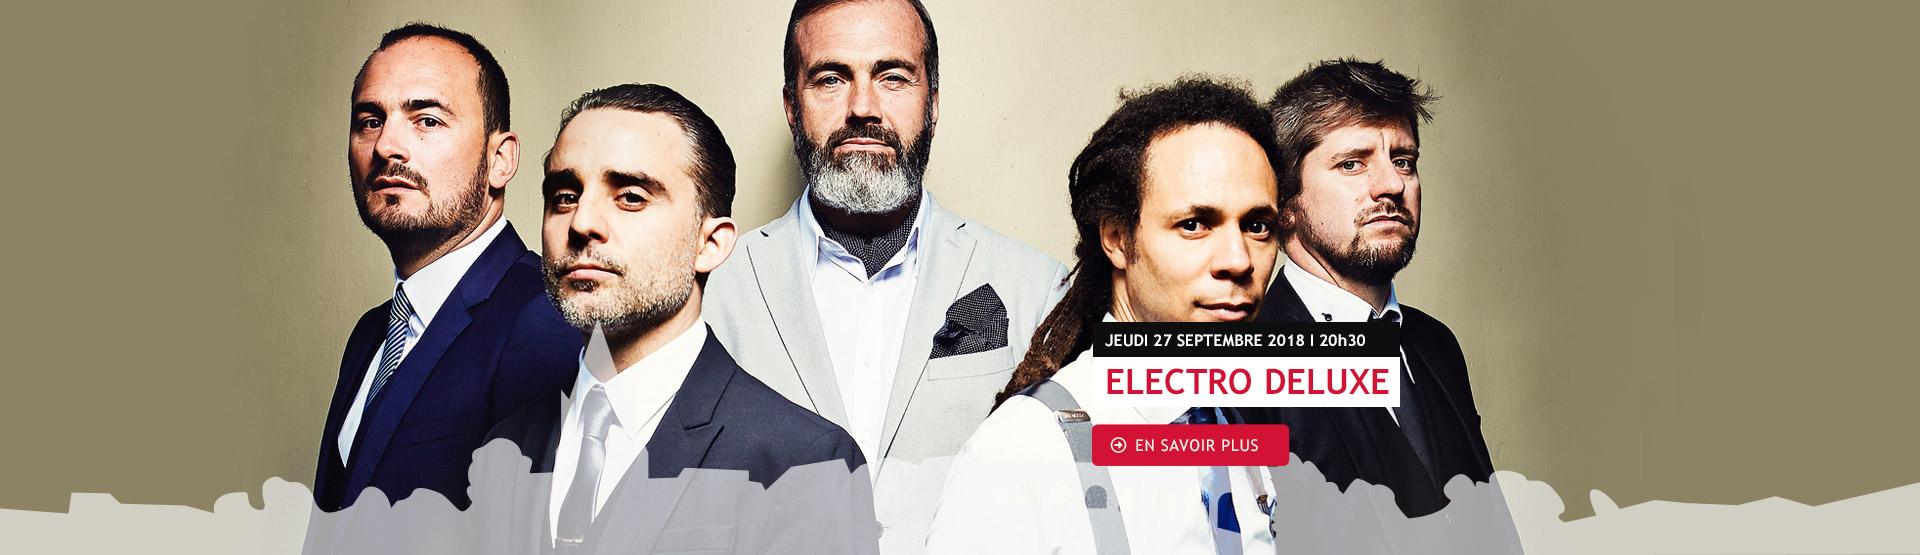 slide1-electro-deluxe